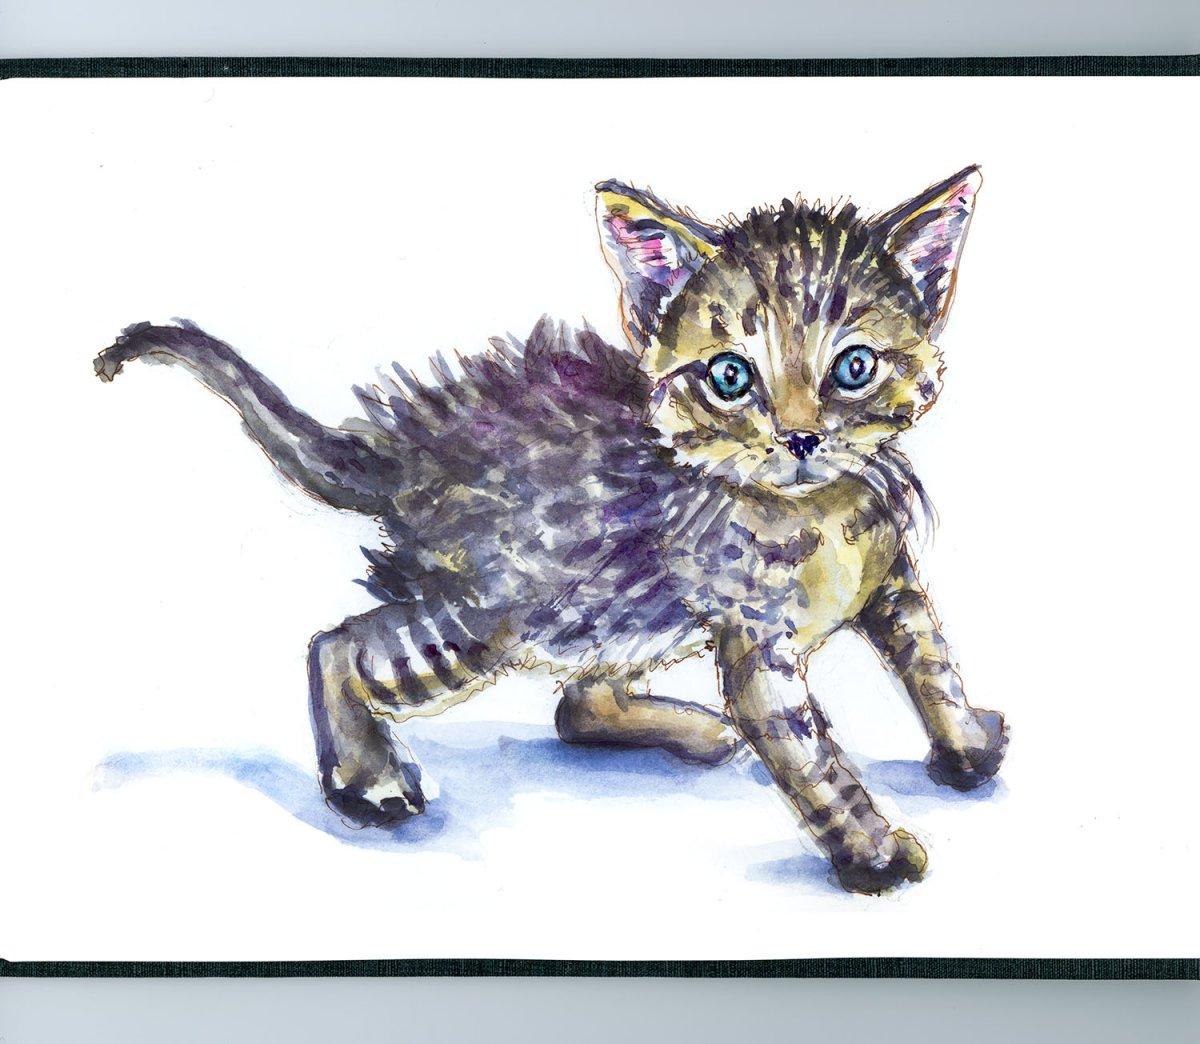 Day 23 - World Watercolor Month Furry Creatures Kitten - Doodlewash